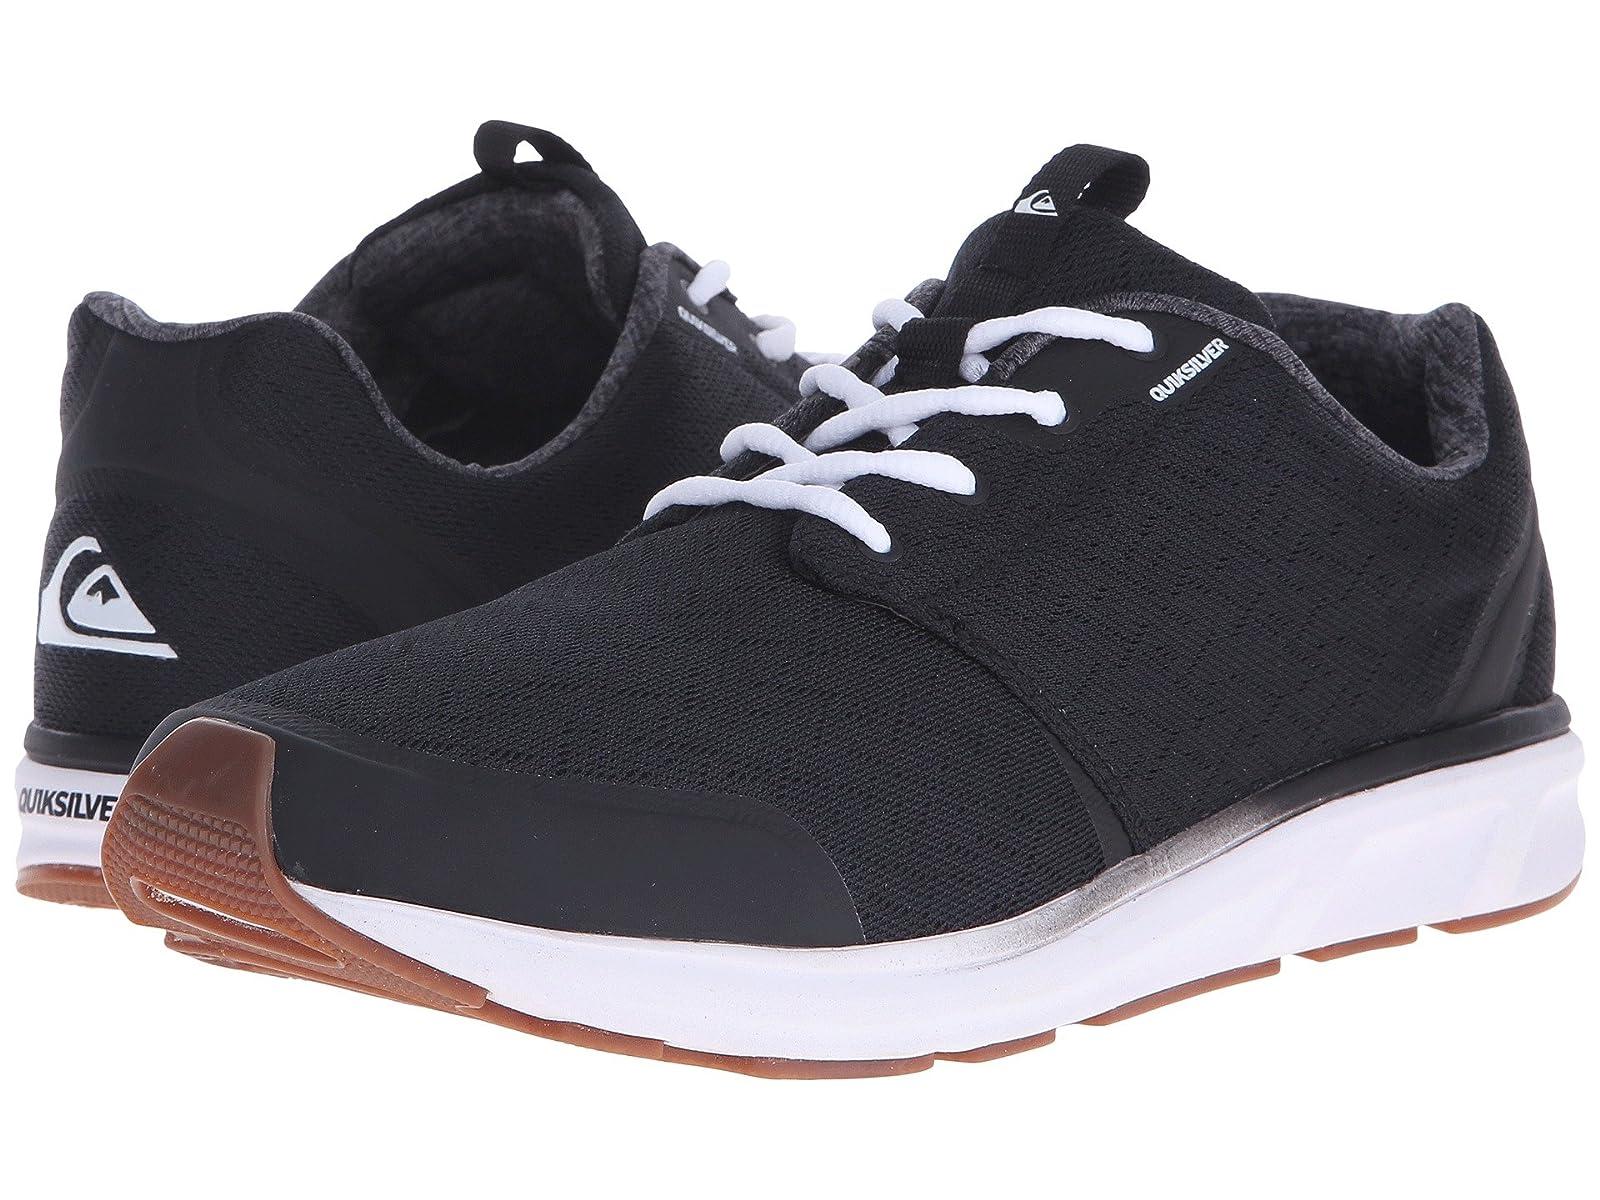 Quiksilver VoyageAtmospheric grades have affordable shoes